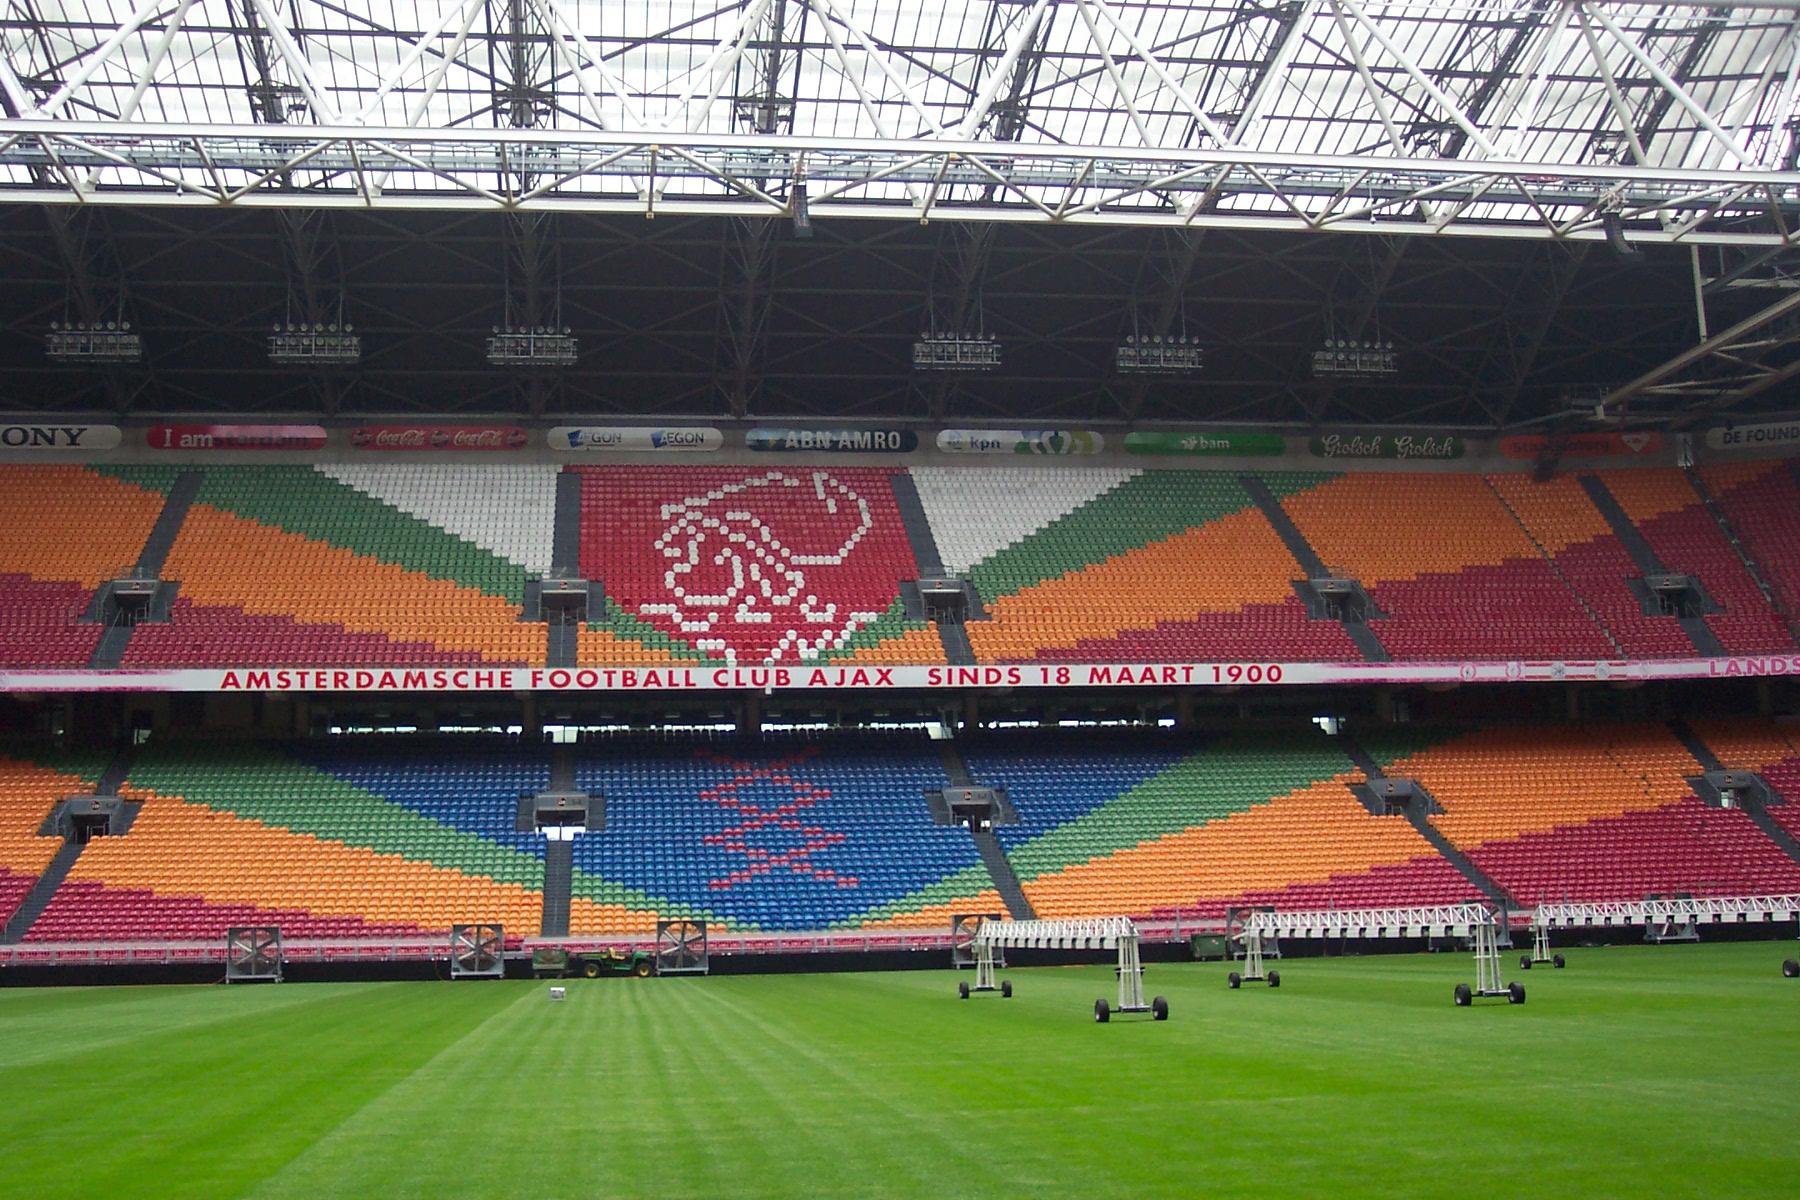 amsterdam arena (29)